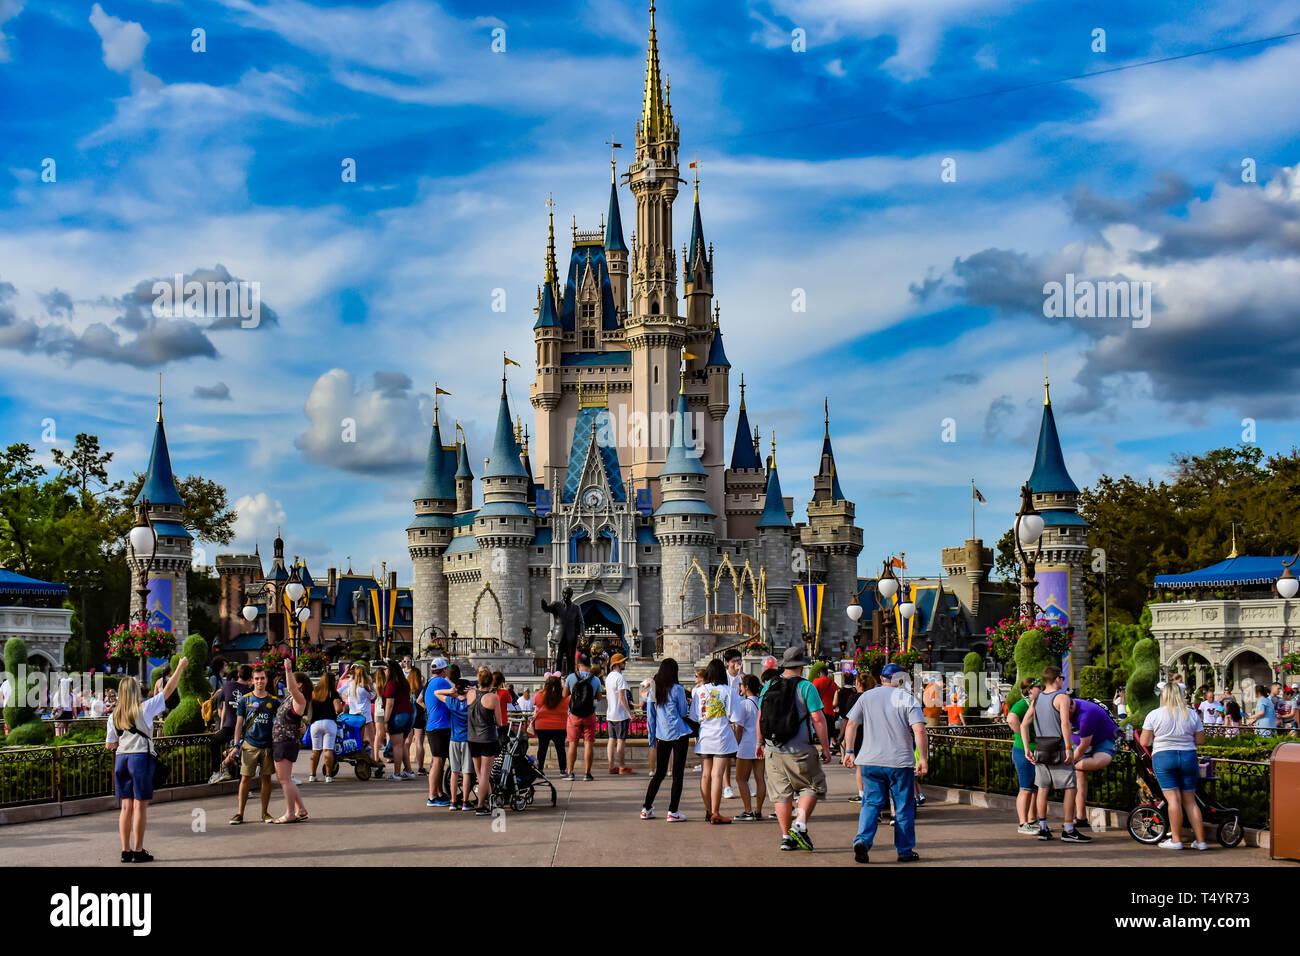 Orlando, Florida  April 02, 2019 Panoramic view of Cinderella's